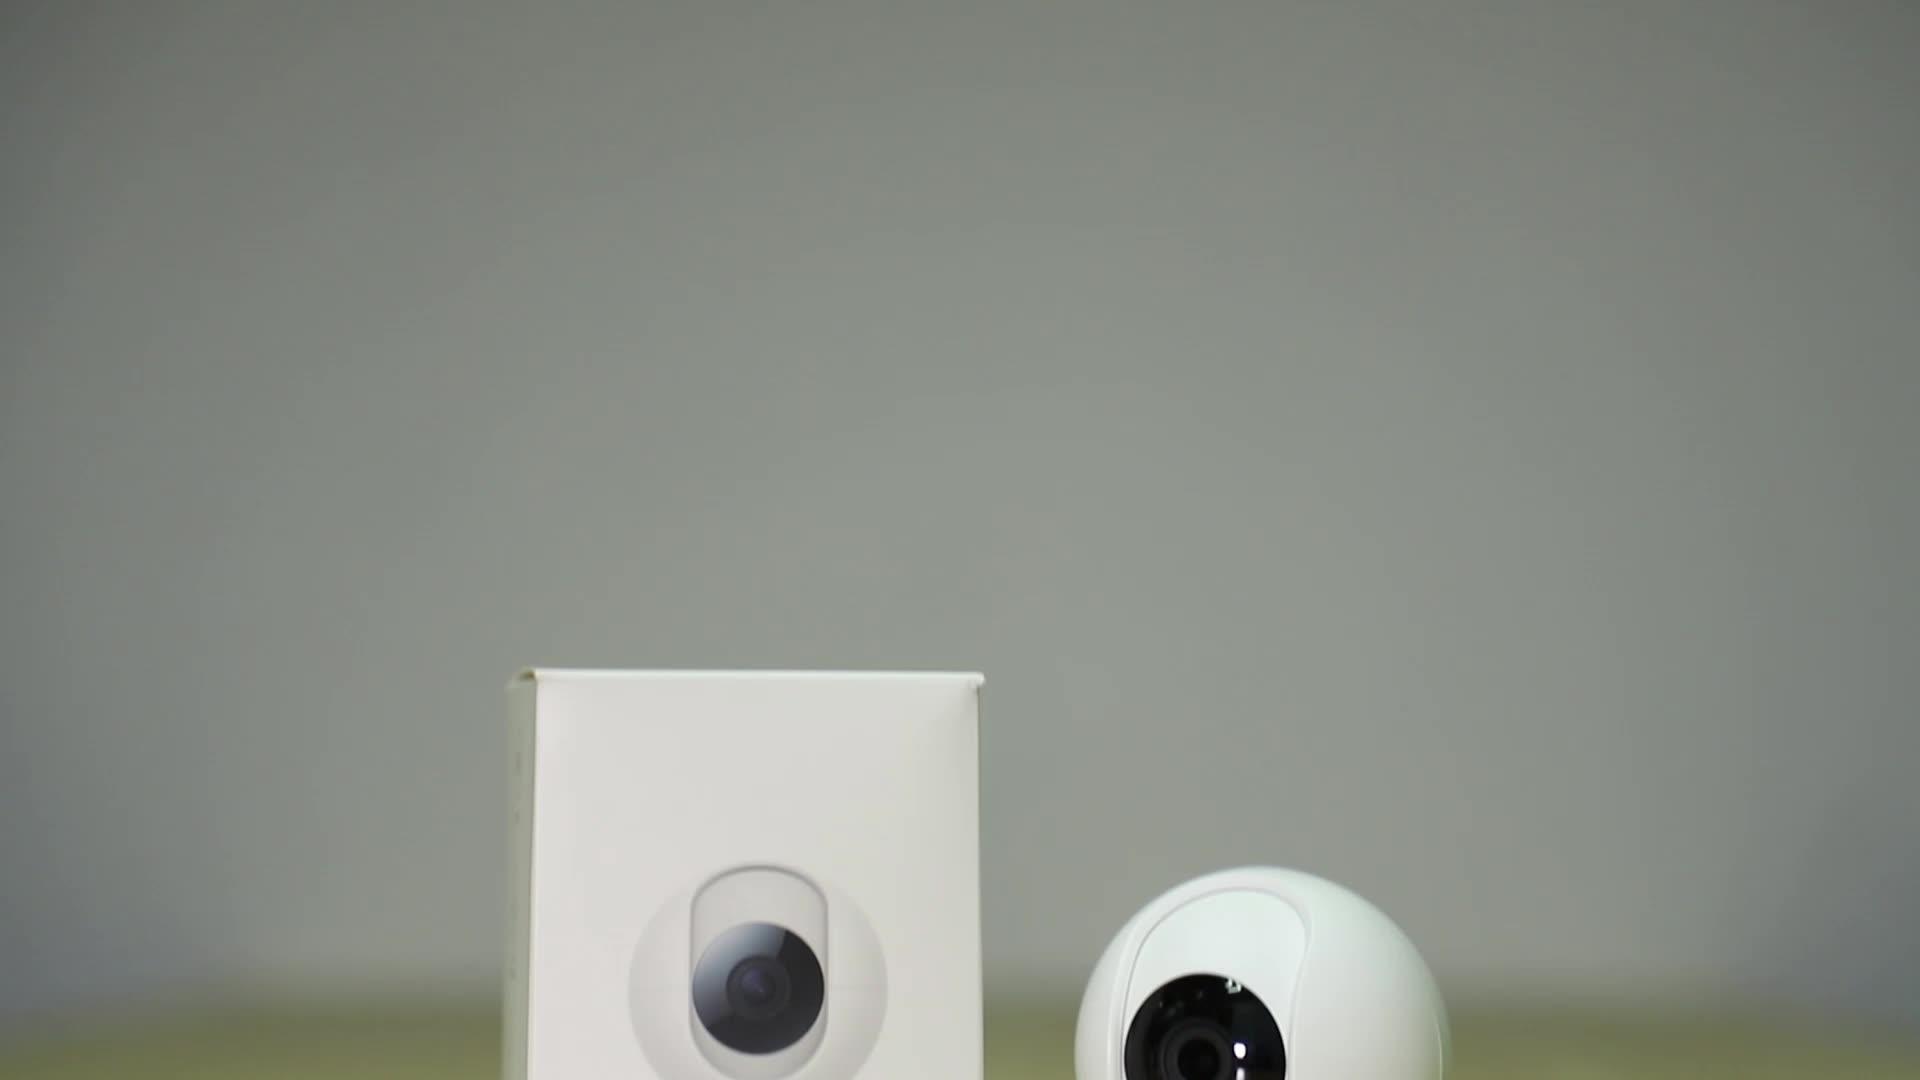 Xiaomi Mijia 360 Angle Caméra De Sécurité Dôme Caméra IP Sans Fil 1080 P Bébé Moniteur CCTV Sécurité Xiaomi Mijia Caméra